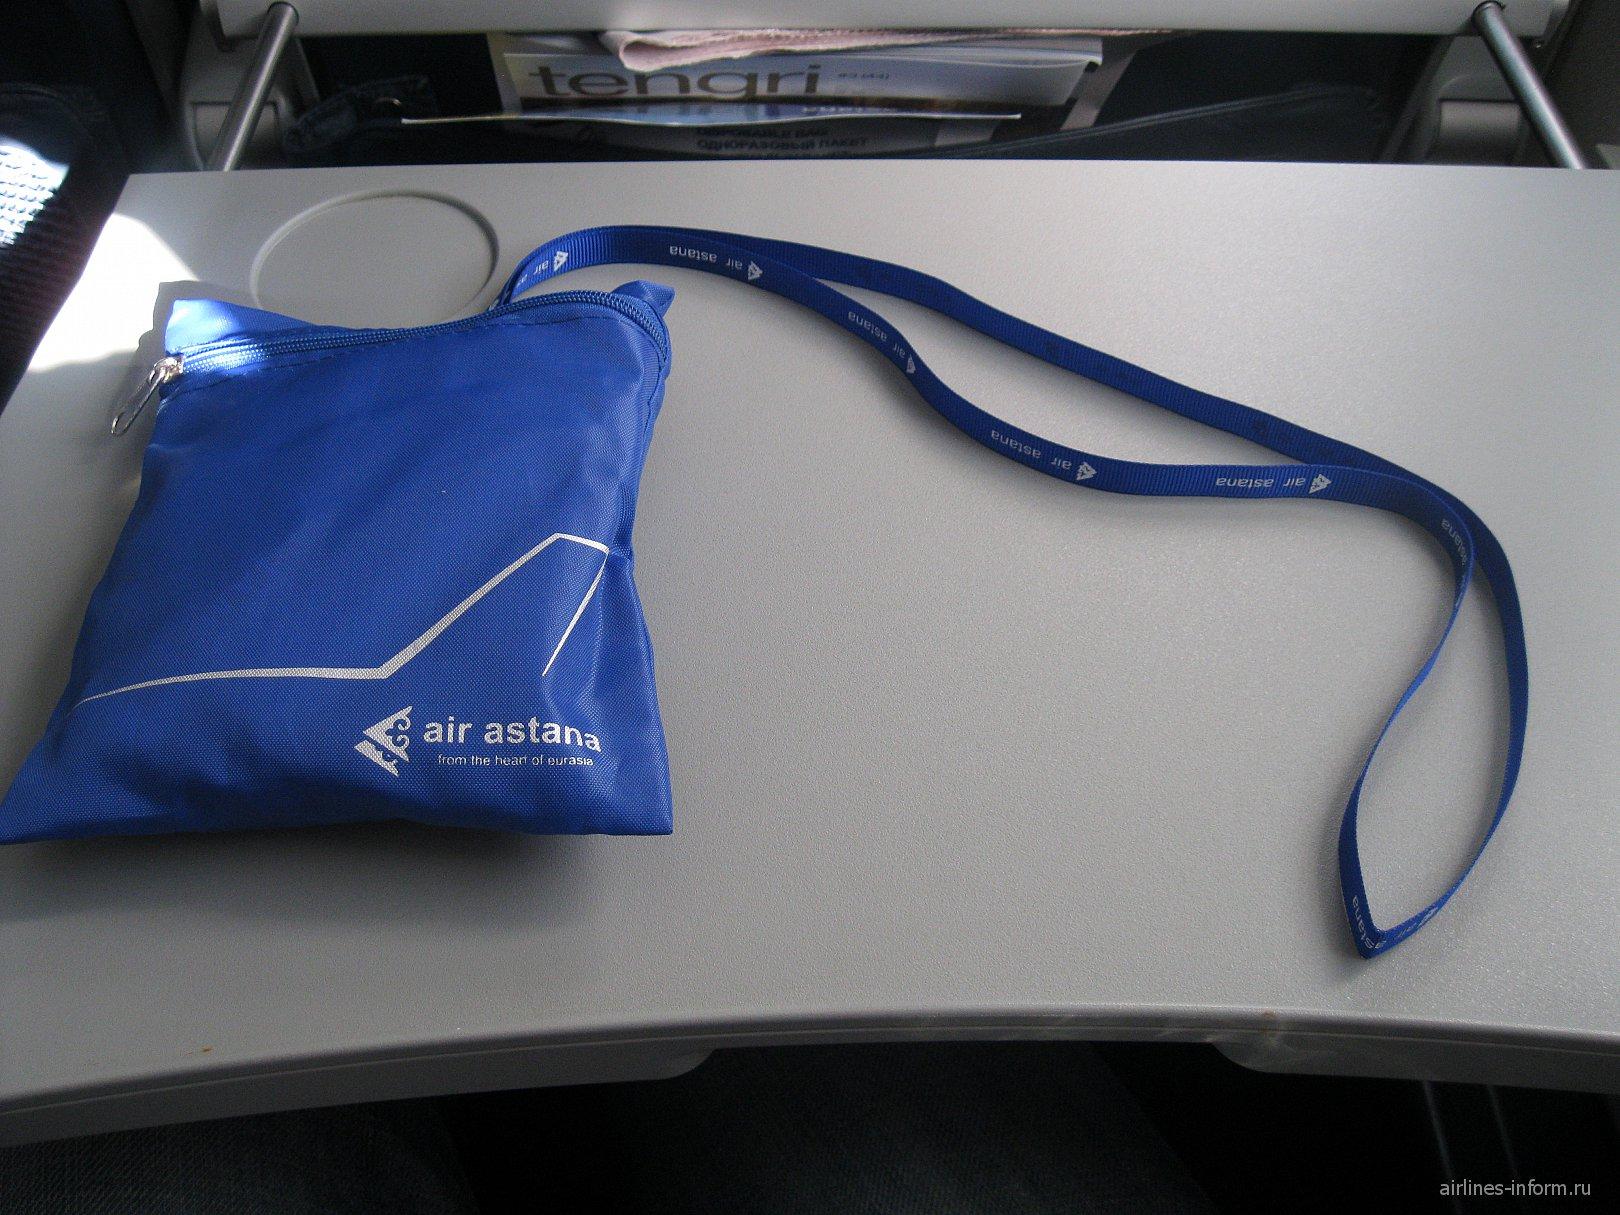 Набор для пассажира авиакомпании Air Astana